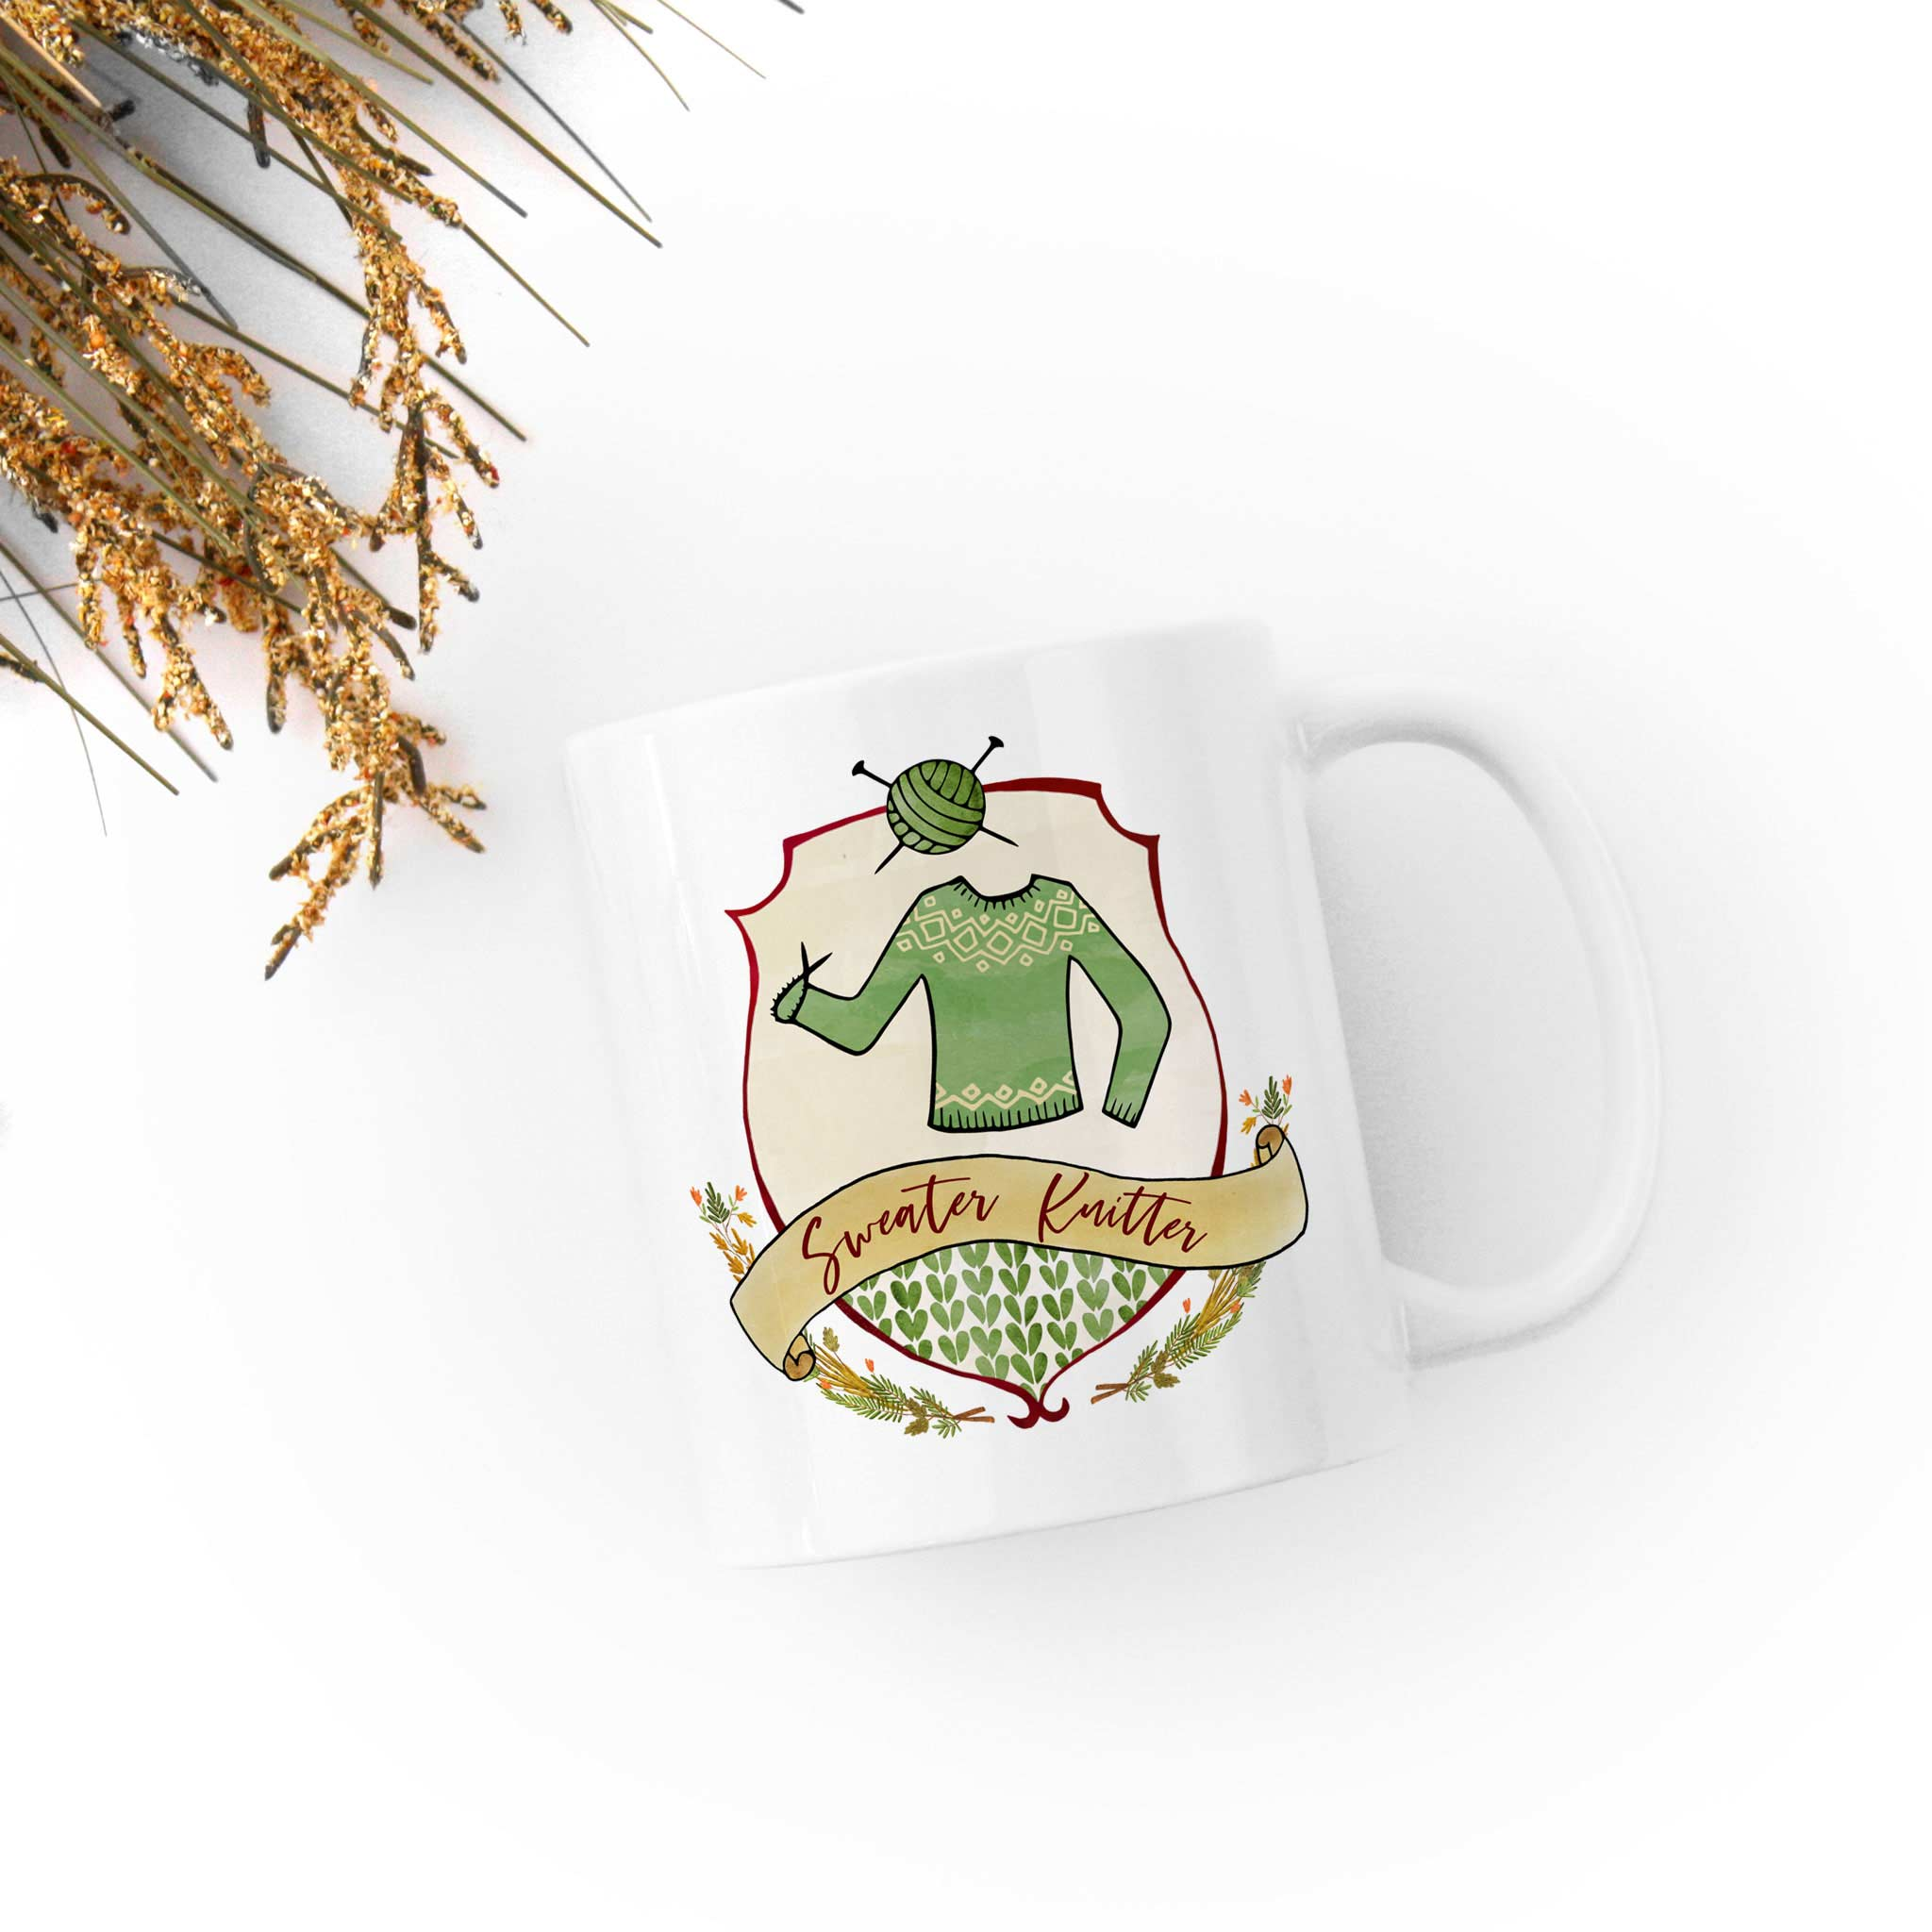 sweater-knitter-mug-2w.jpg